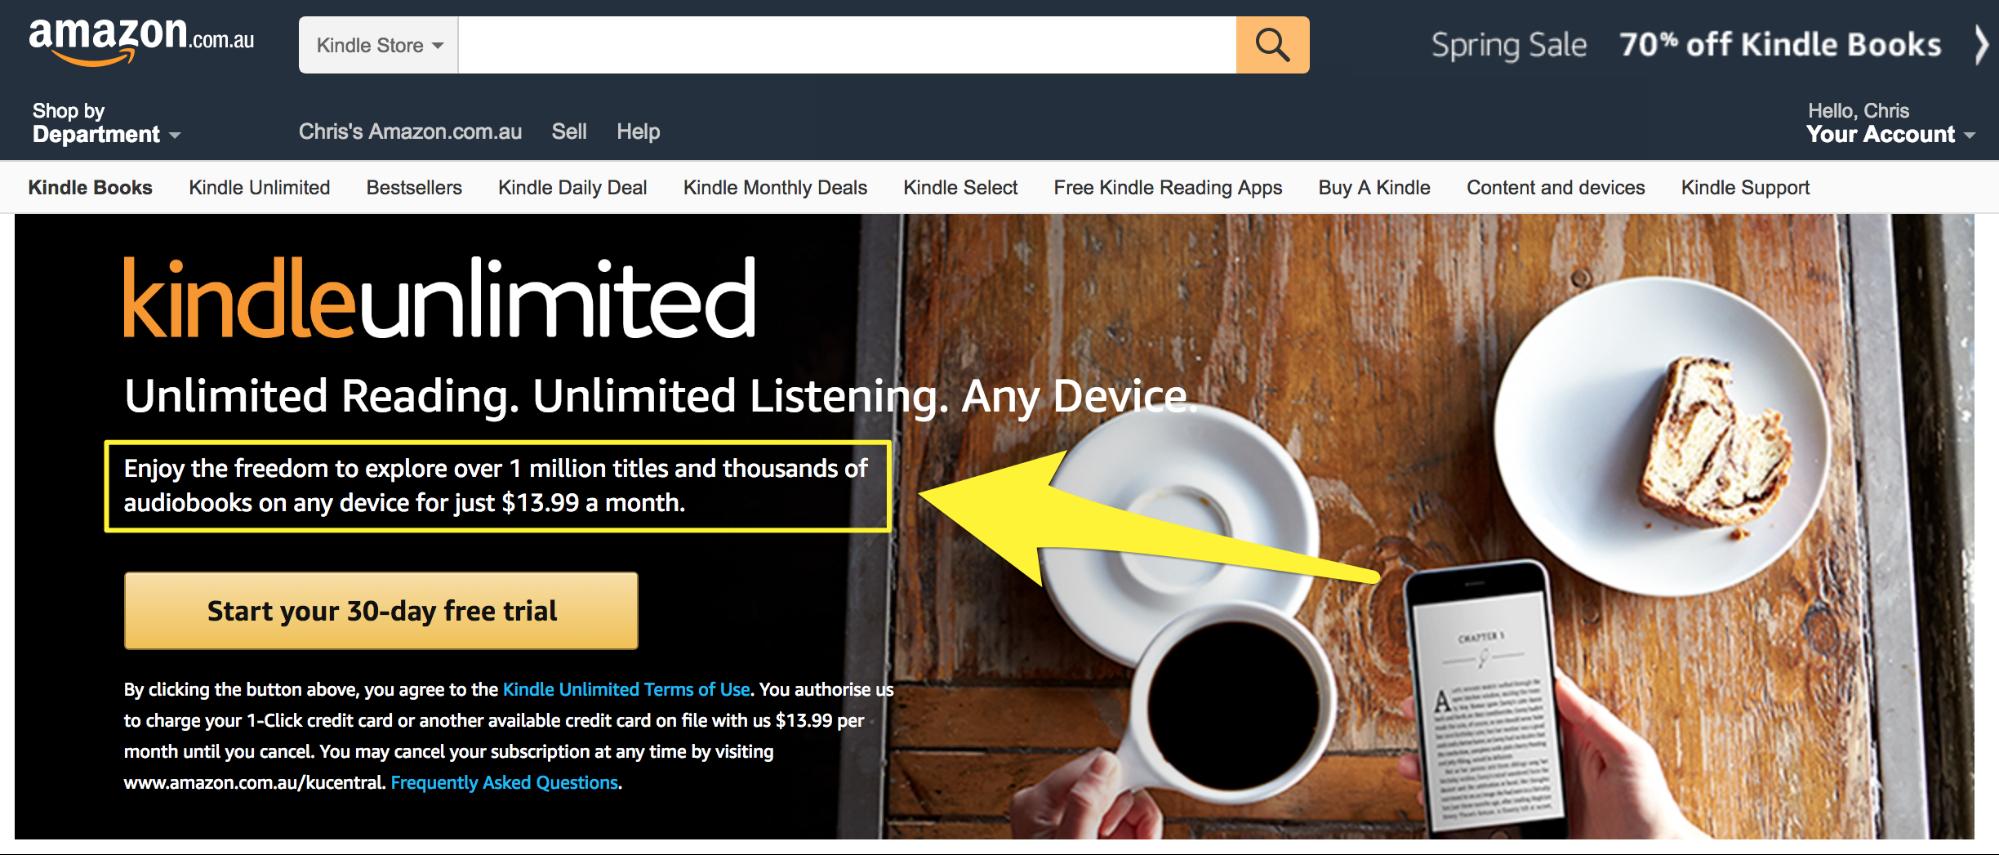 How Amazon Generates $136 Billion In Sales